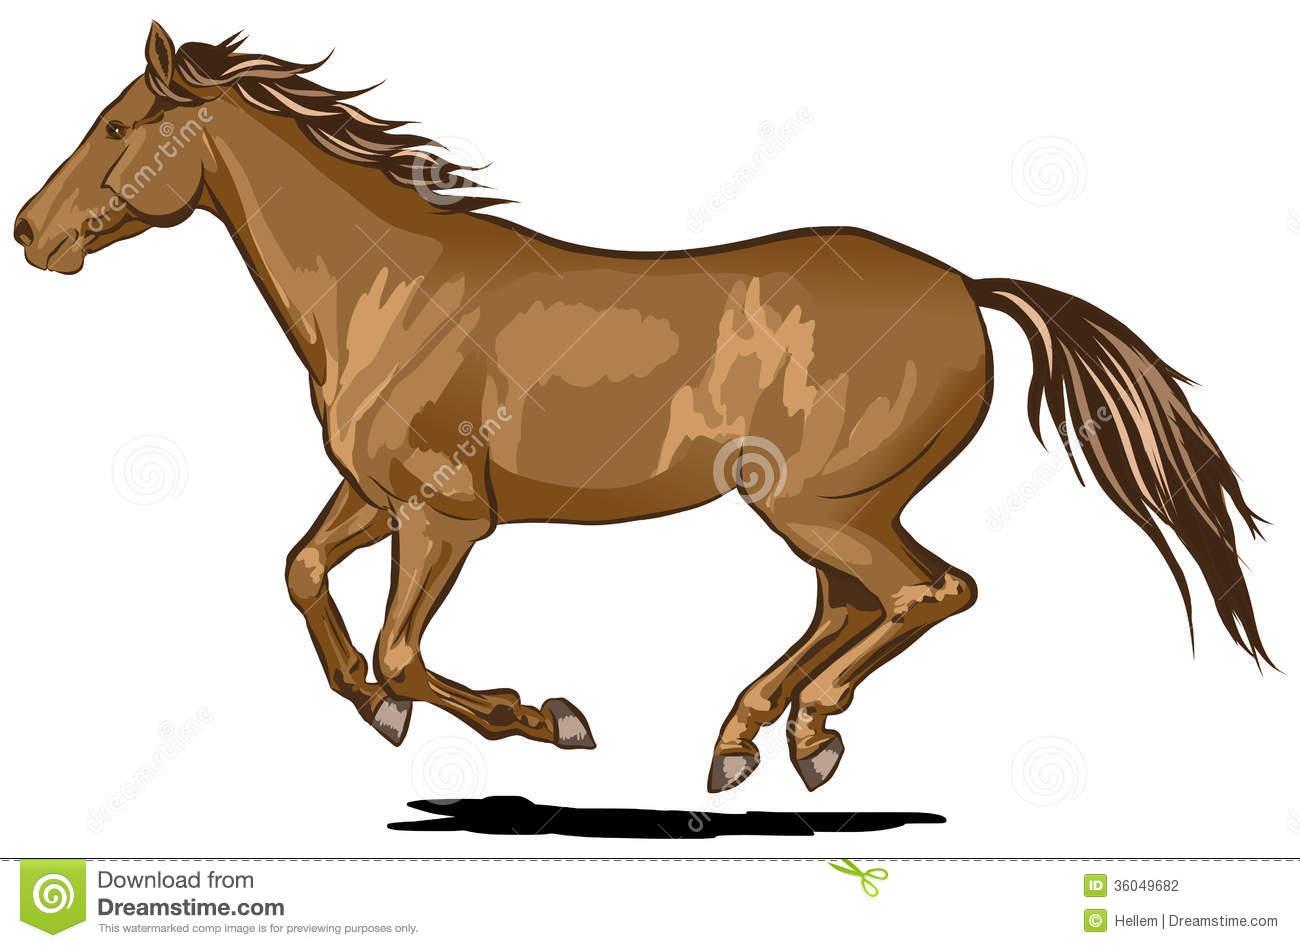 60 running horse.